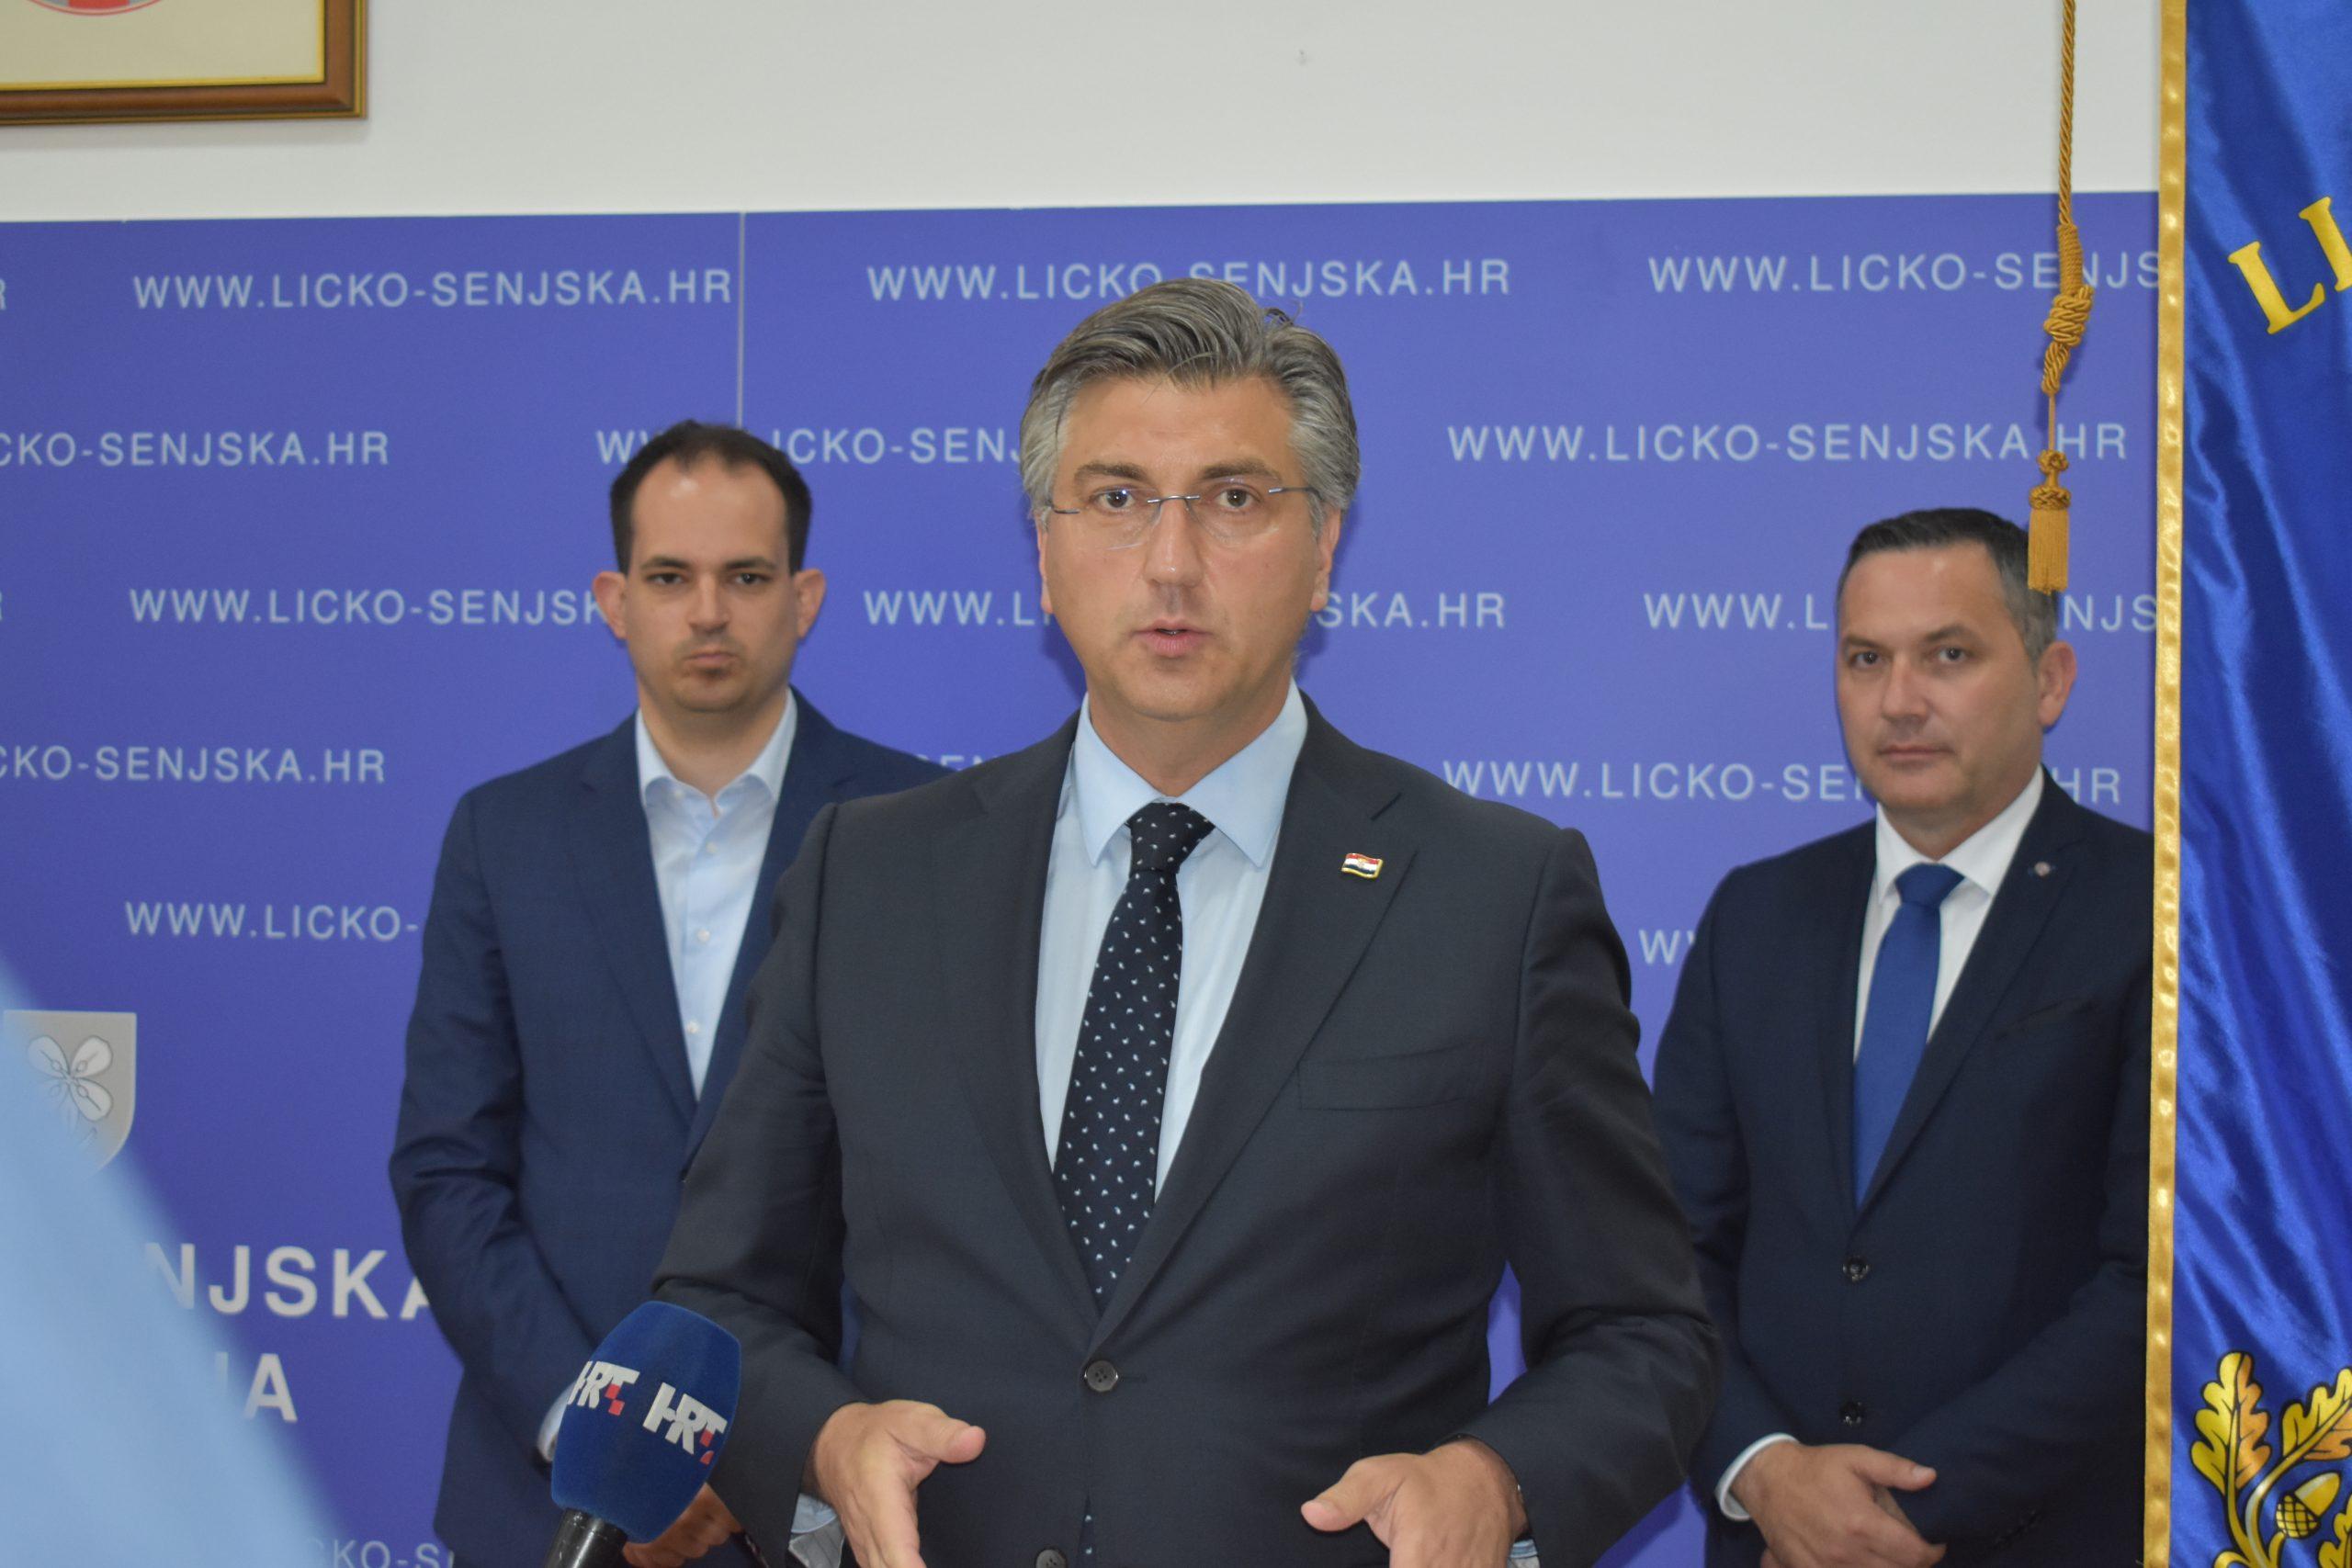 Andrej Plenković u Lici / Snimio Marin Smolčić